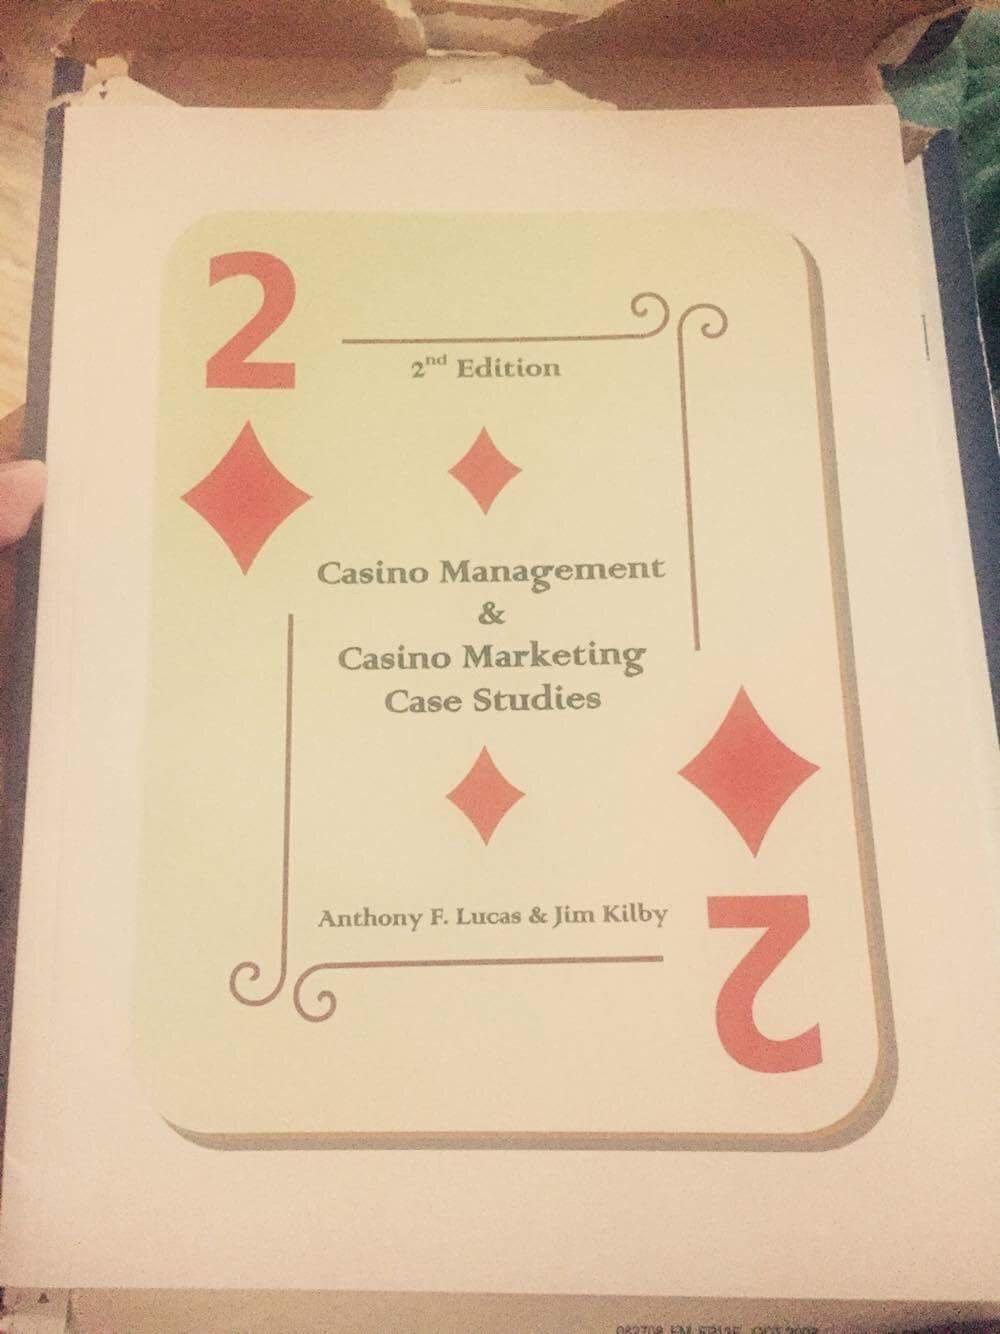 Download Casino Management & Casino Marketing Case Studies 2nd Edition PDF